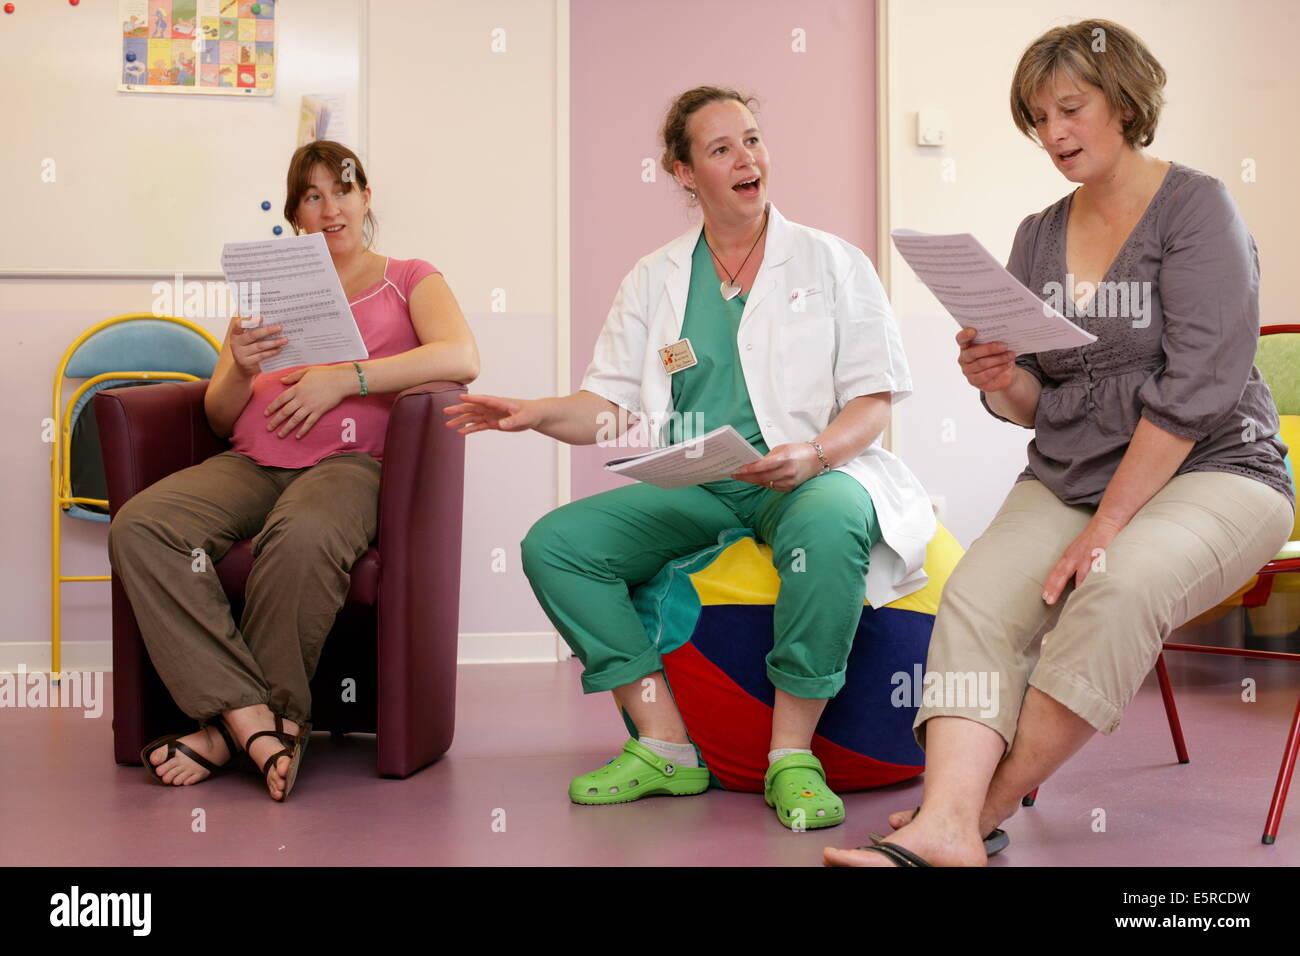 A musician runs a antenatal and postnatal singing workshop, aimed at parents as well as maternity nursing staff, - Stock Image